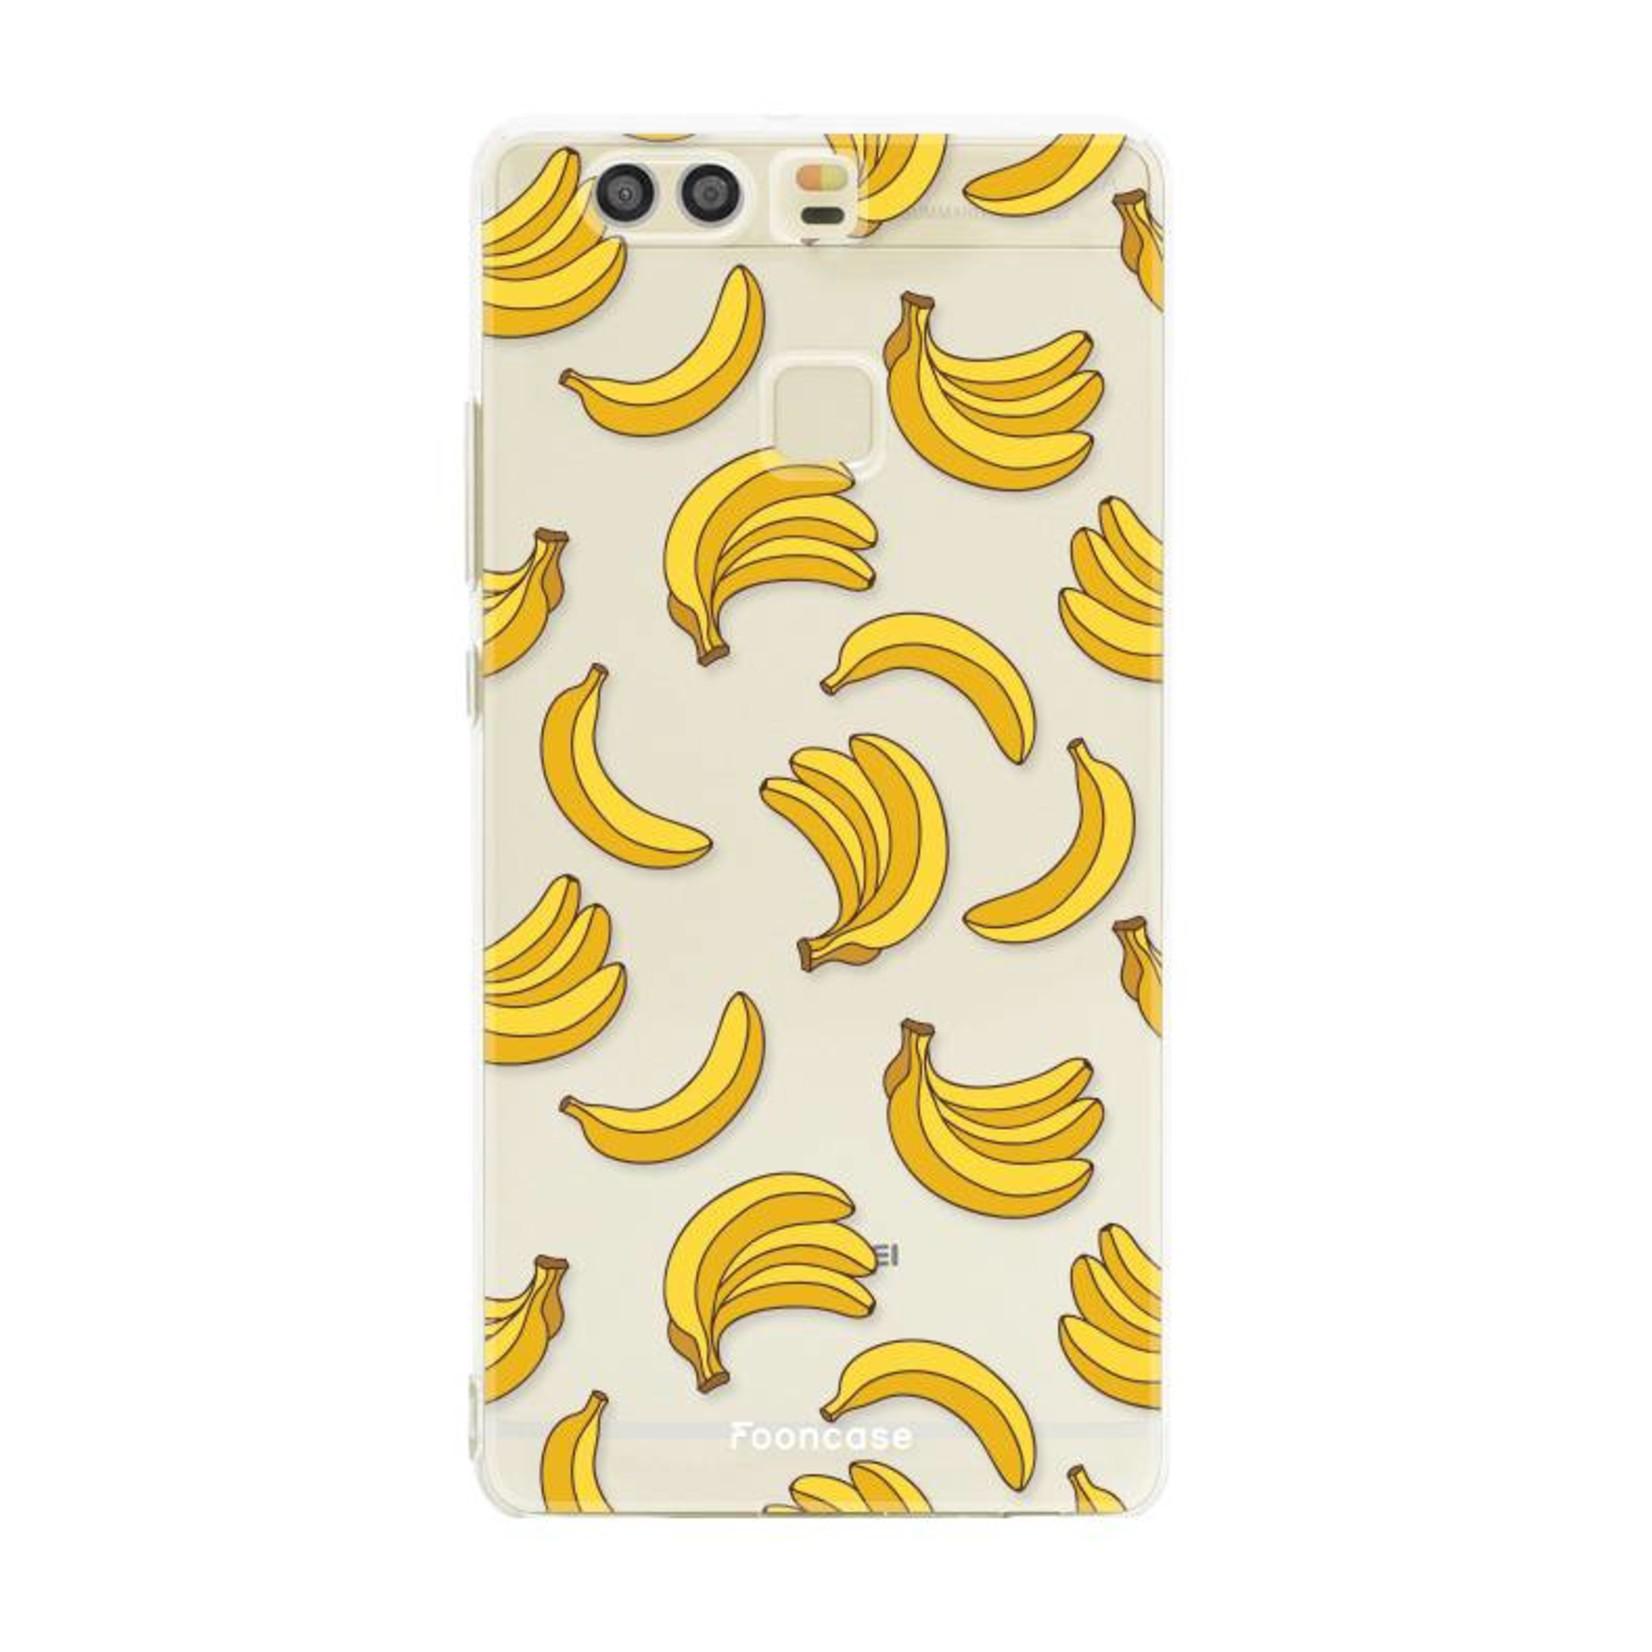 FOONCASE Huawei P9 hoesje TPU Soft Case - Back Cover - Bananas / Banaan / Bananen